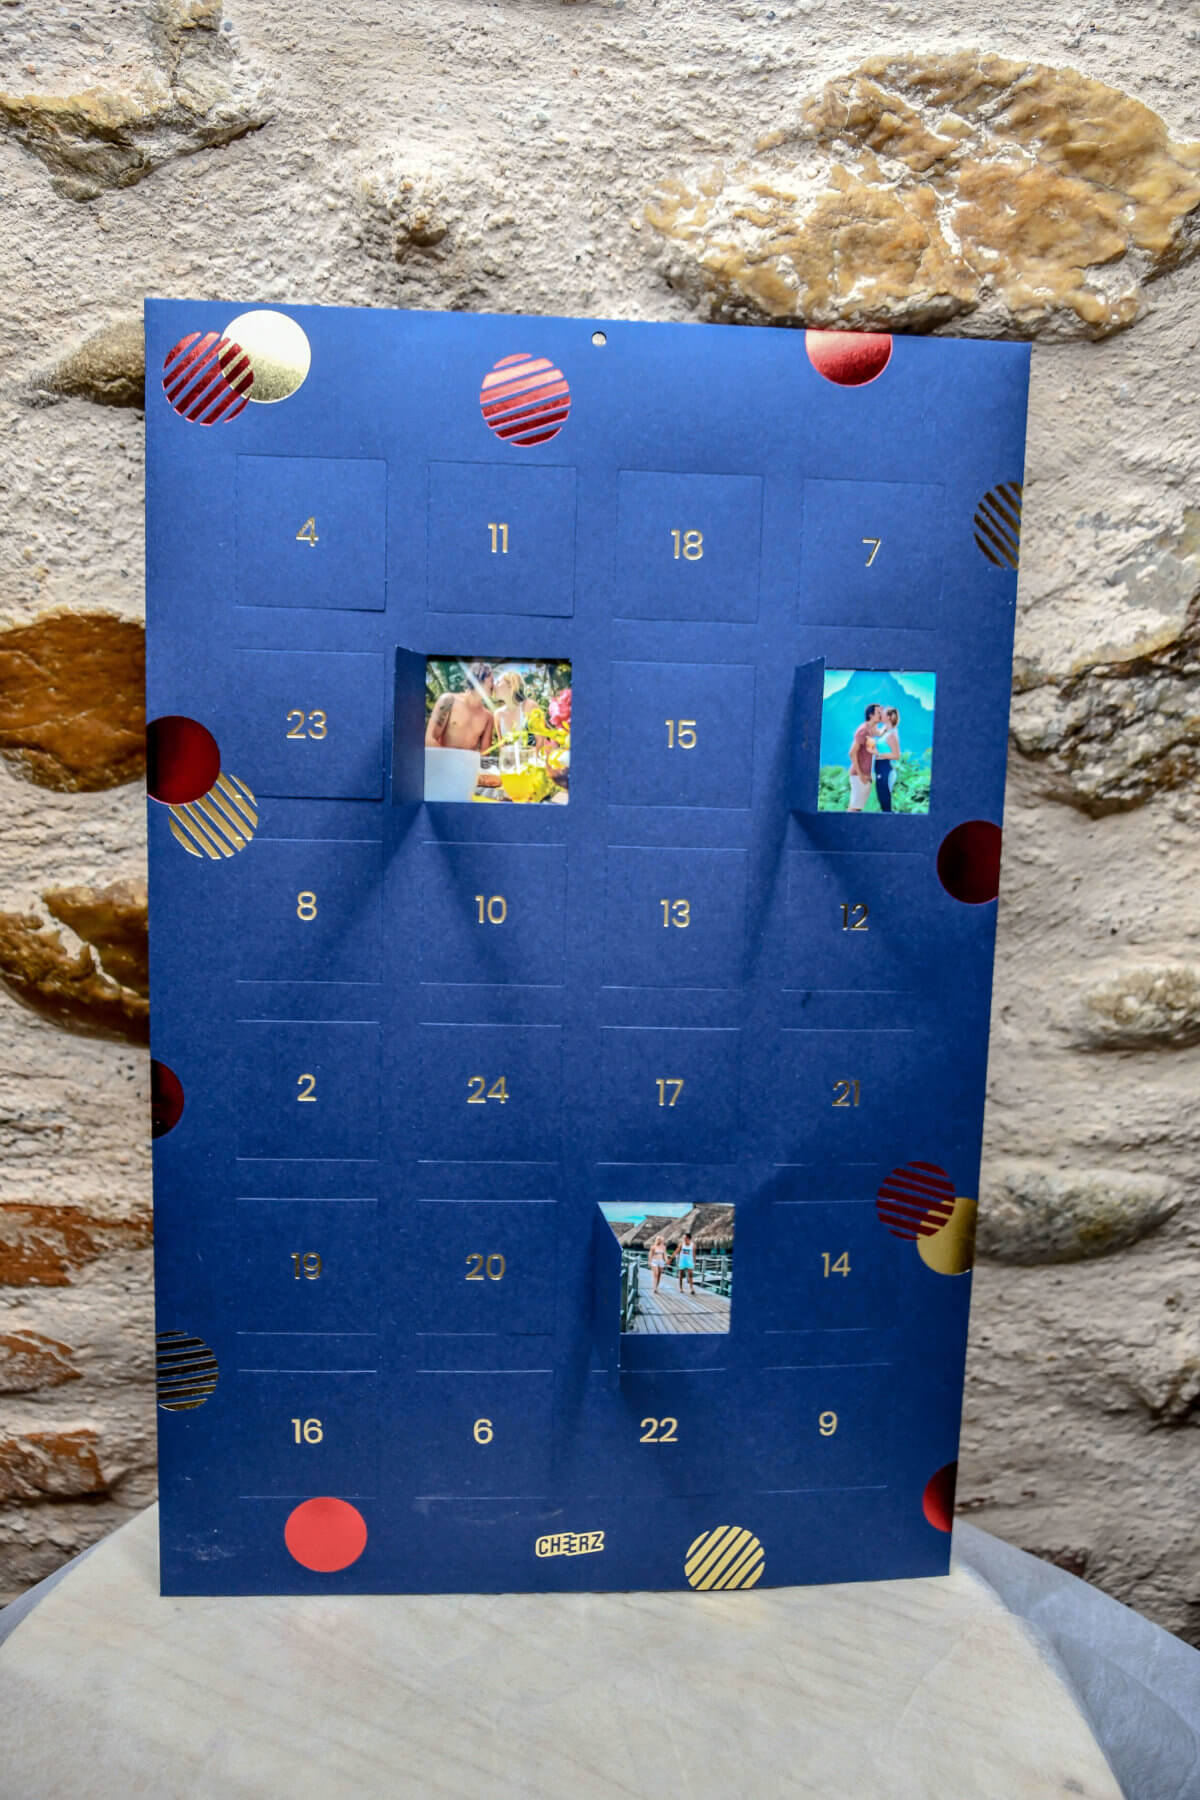 Calendrier De L'avent Cheerz : calendrier, l'avent, cheerz, CHEERZ, Idée, Cadeaux, Noël, Revue, Kathleen, Voyage